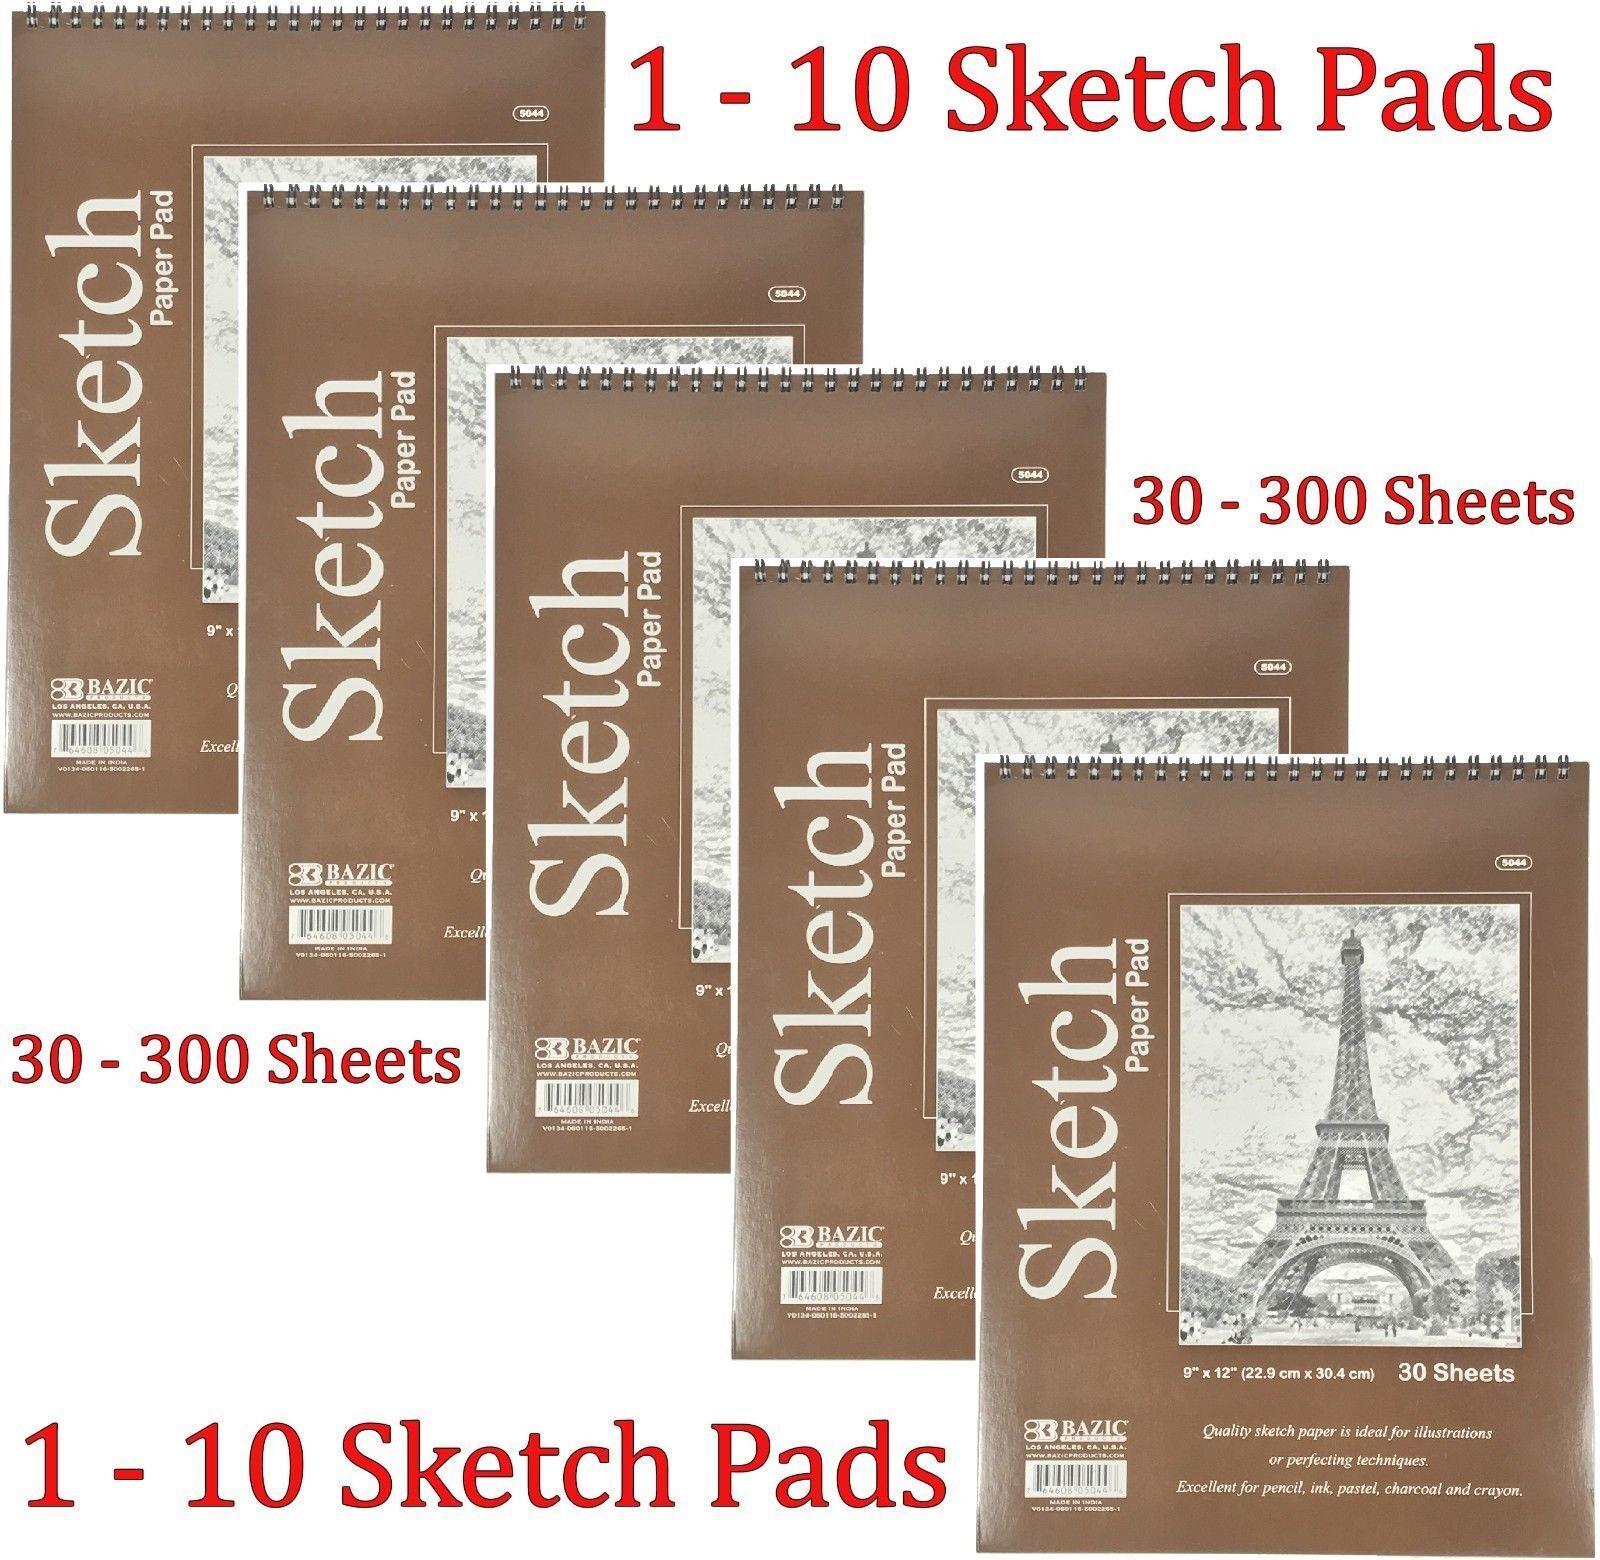 "Spiral Sketch Pad Book 9"" x 12"" Art Drawing Paper 30 sheets"